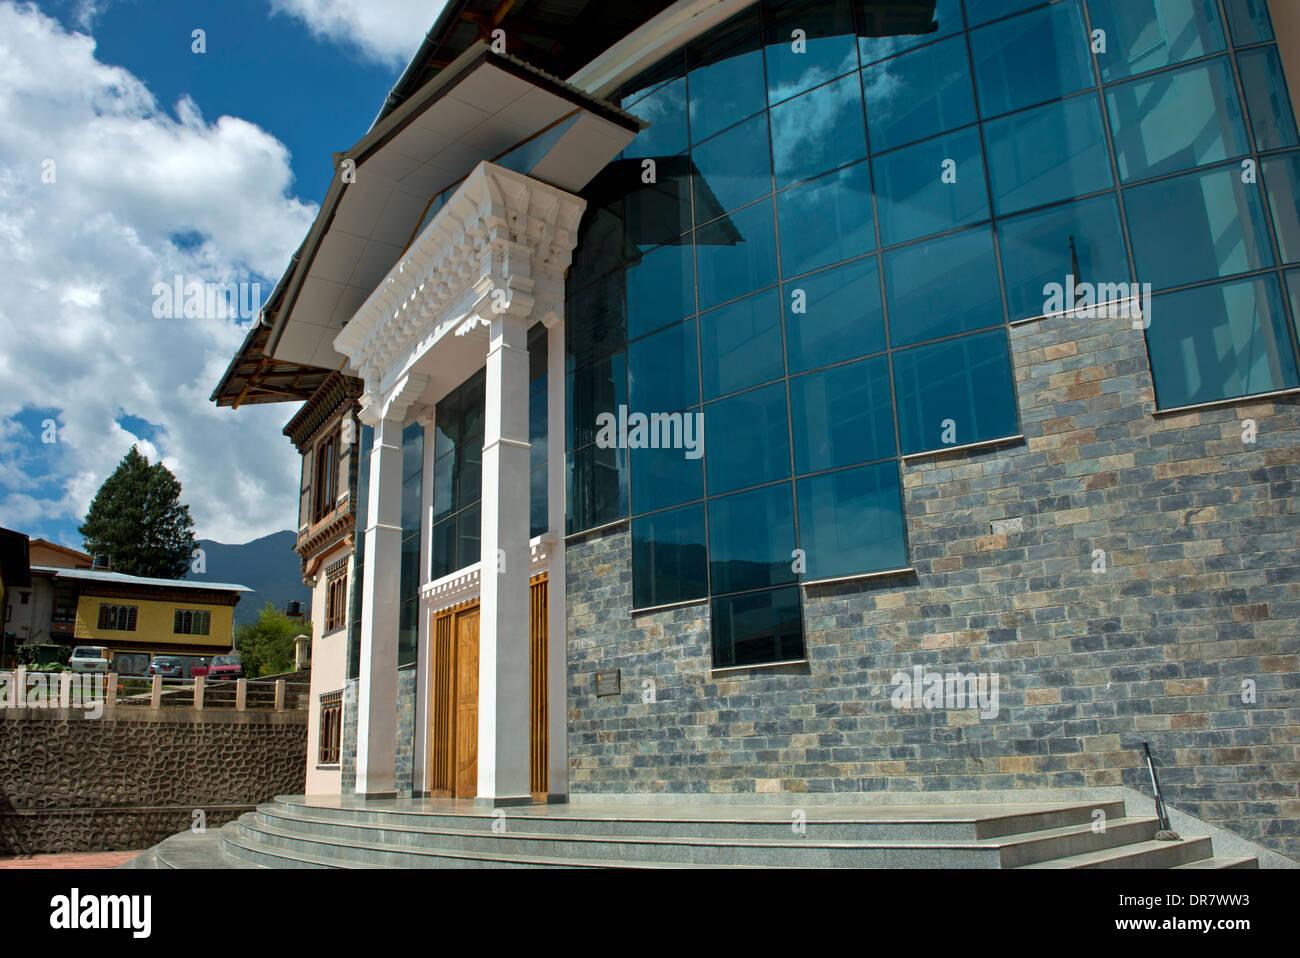 Headquarters of the Royal University of Bhutan, Thimphu, Bhutan - Stock Image